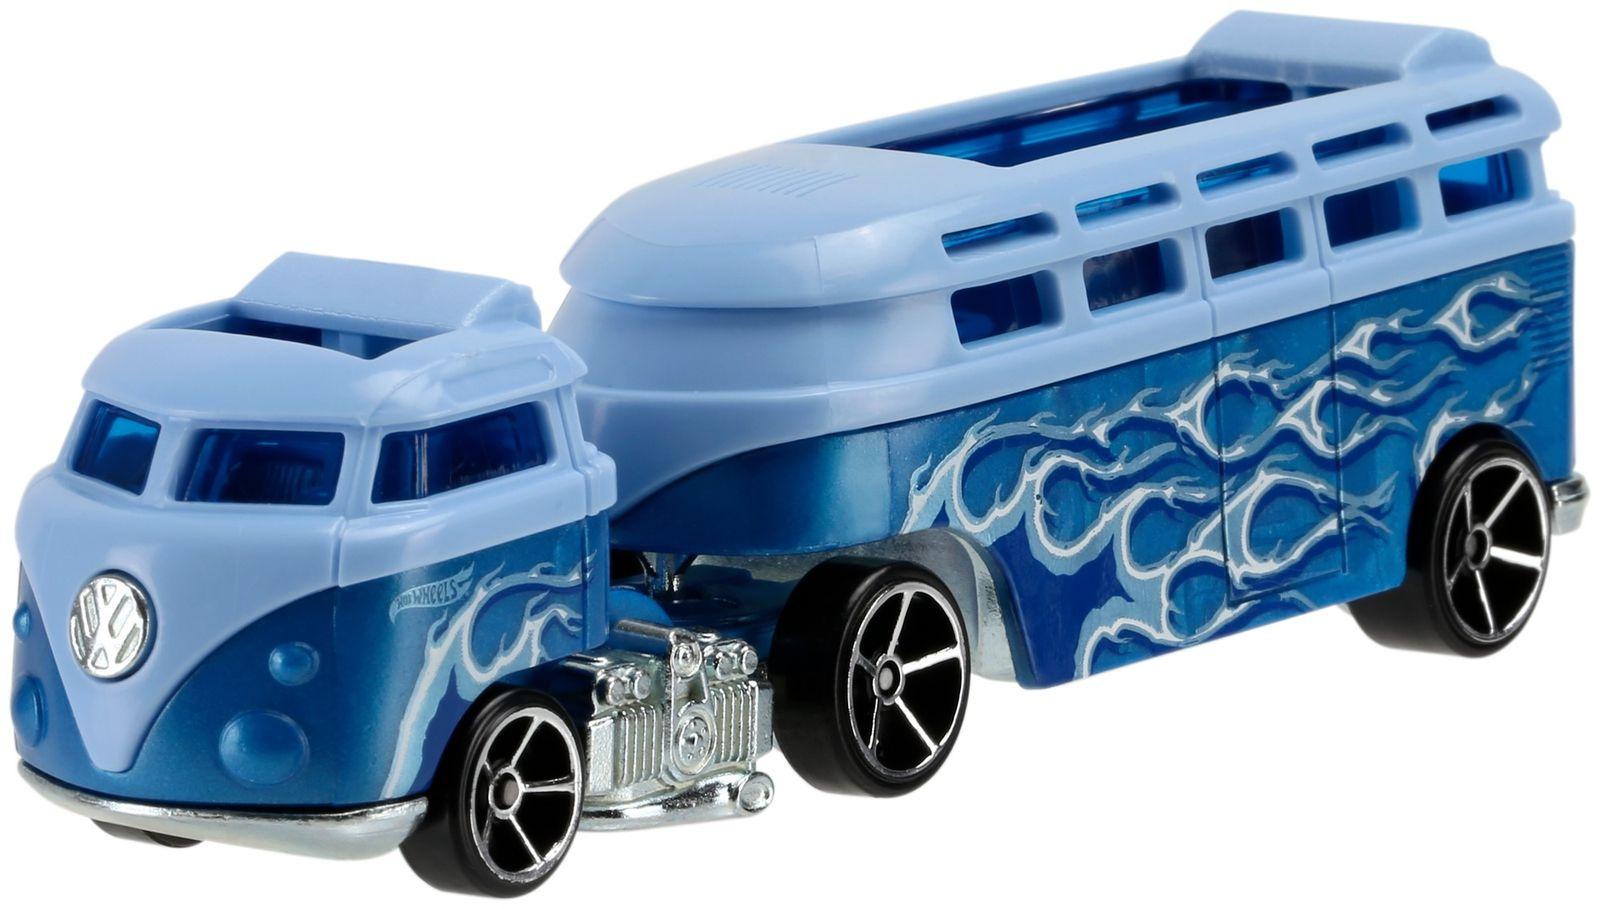 Hot Wheels Track Stars Track Trucks цвет голубой hot wheels track stars трейлер aero blast